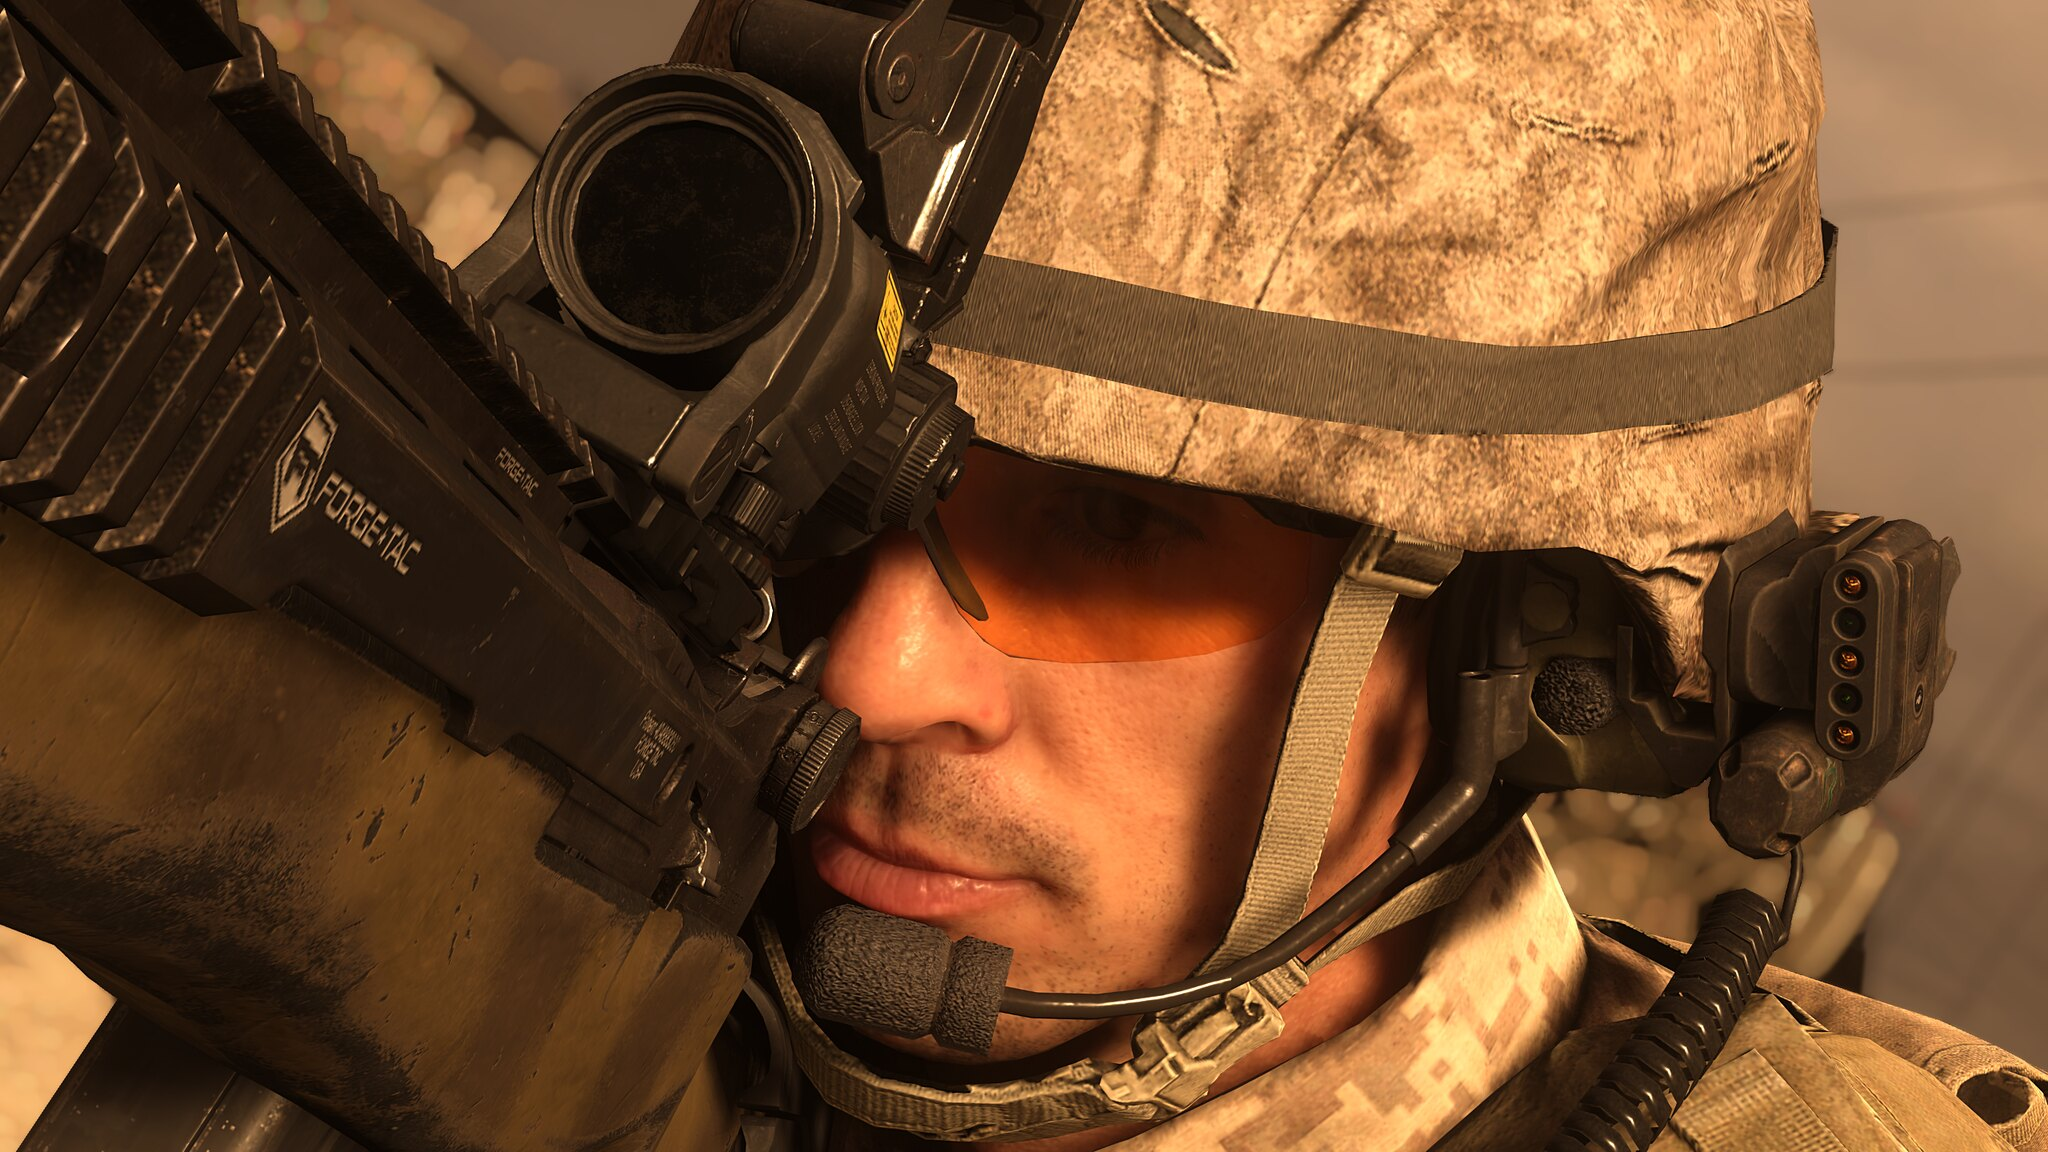 48960944047_ae1d4c3e20_k.jpg - Call of Duty: Modern Warfare (2019)